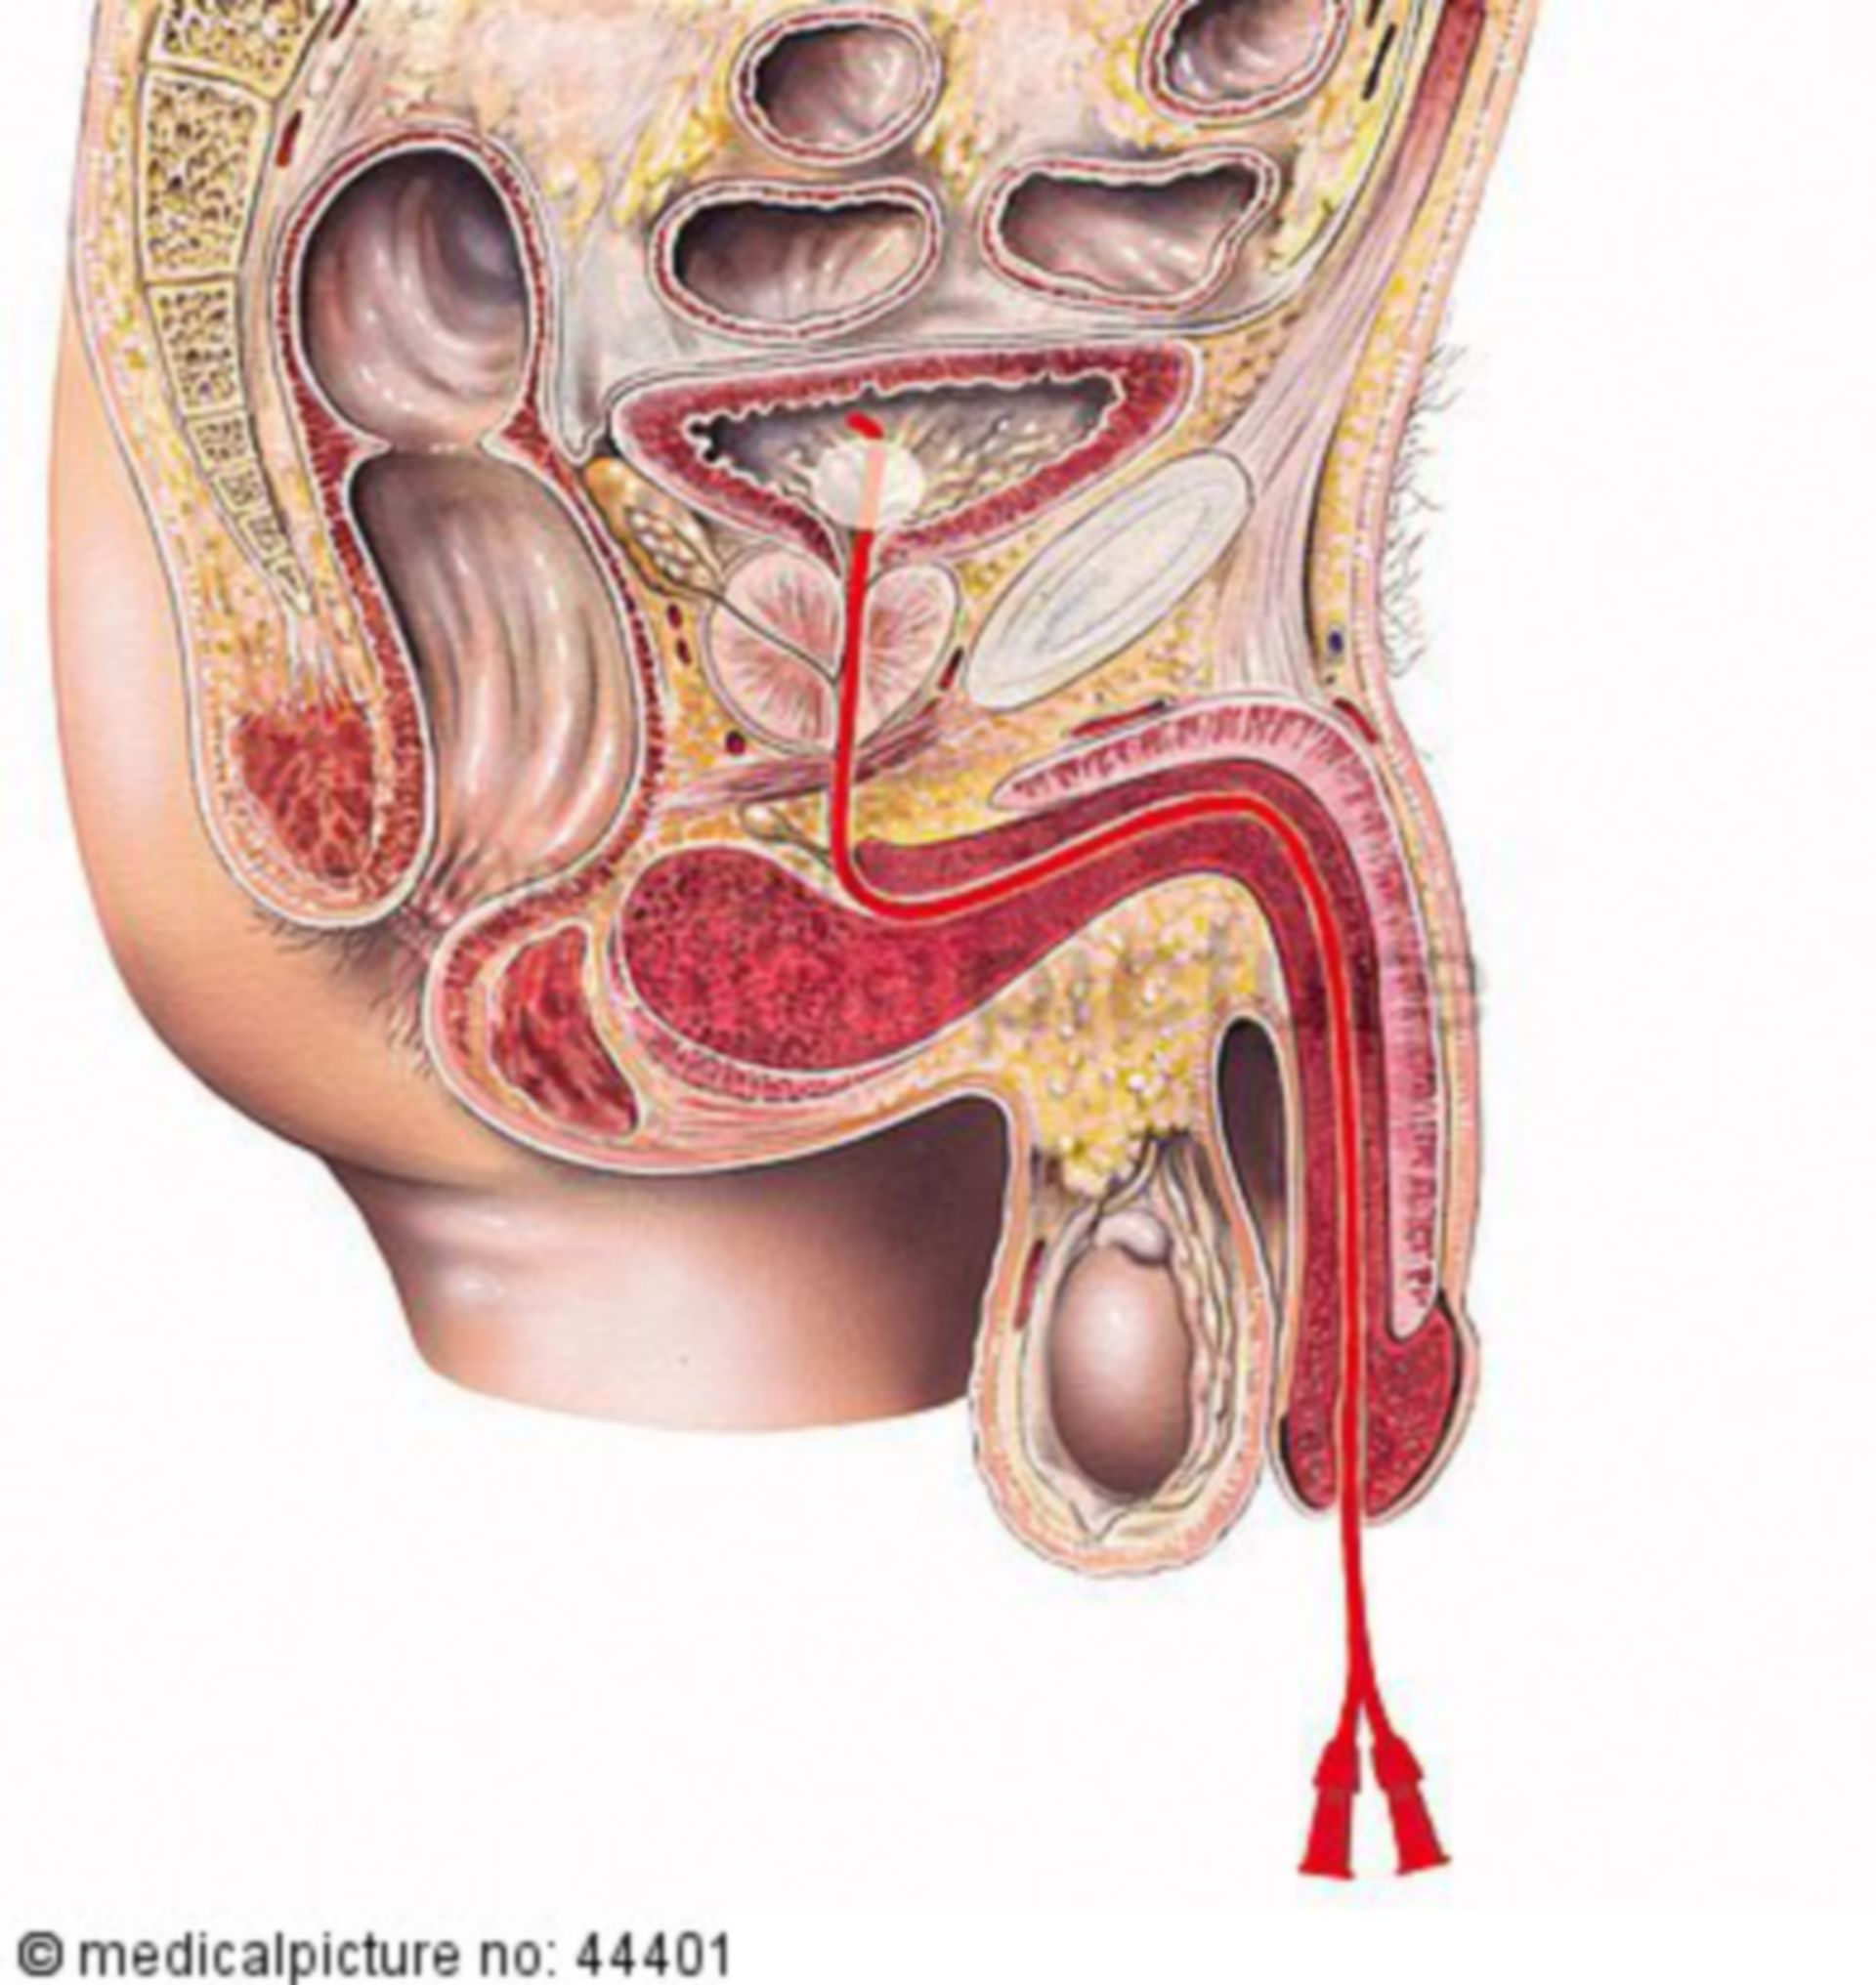 Catéter urinario en un hombre